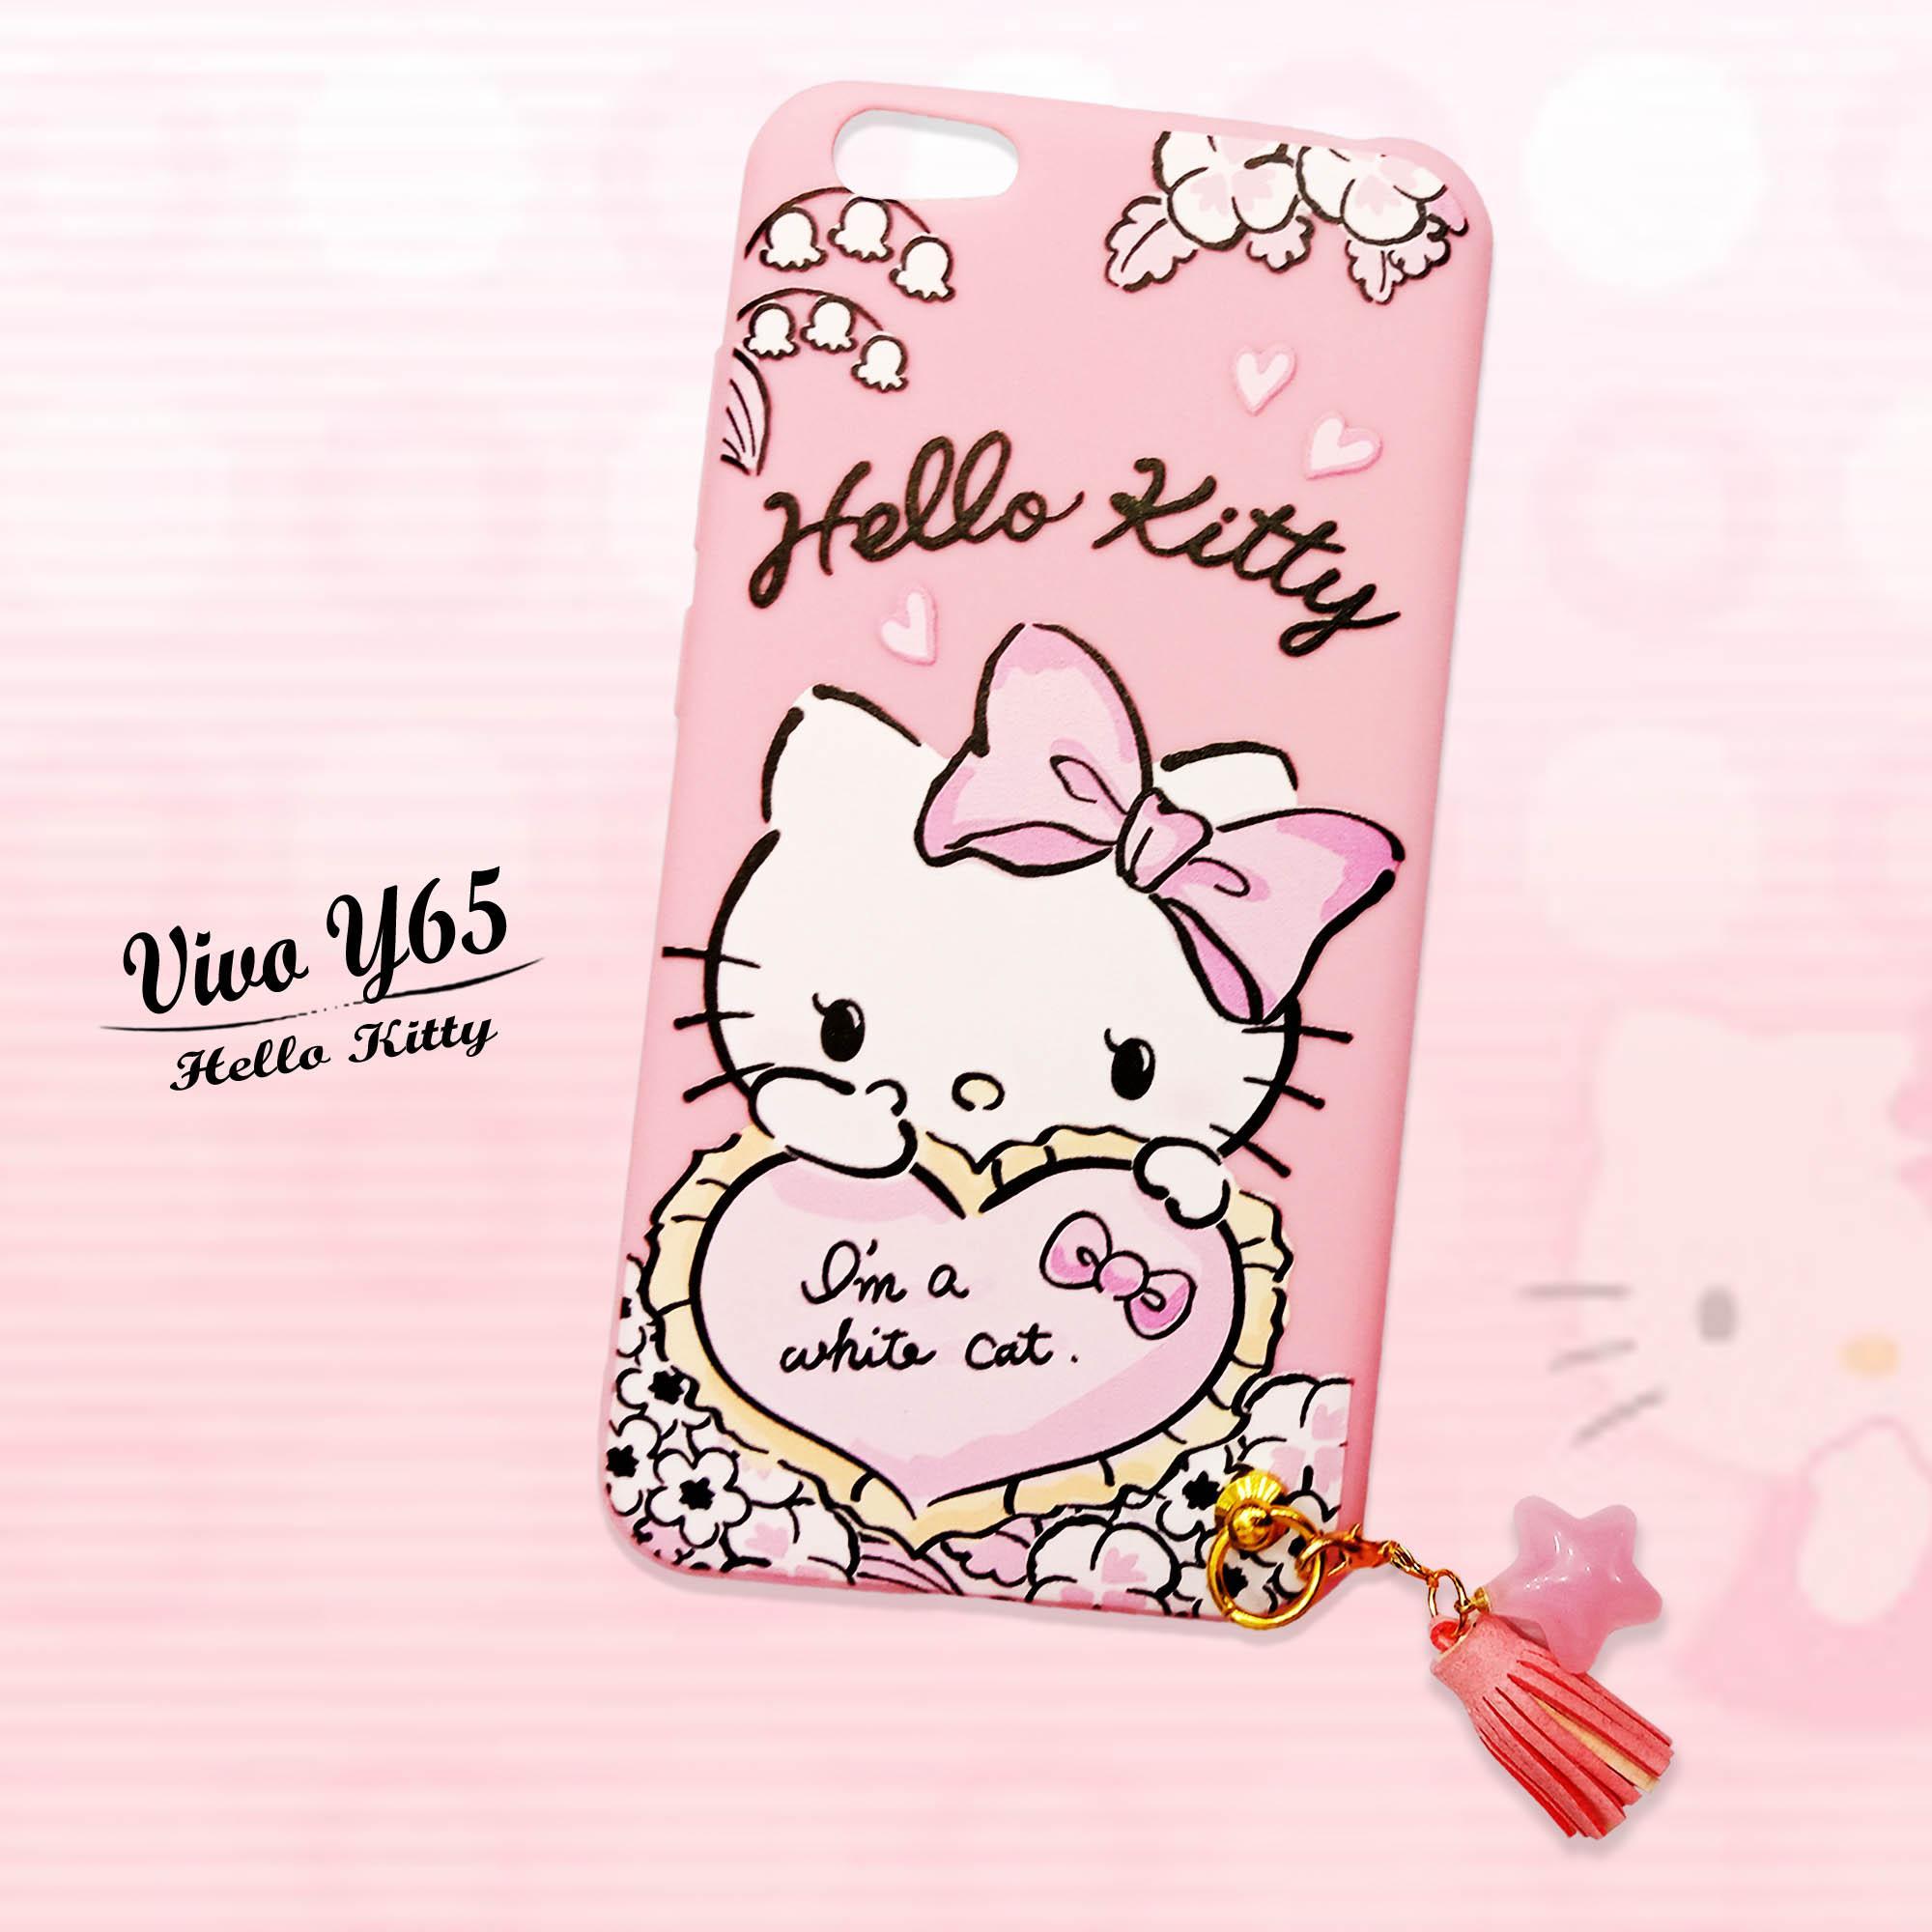 Marintri Case Vivo Y65 New Hello Kitty Melody